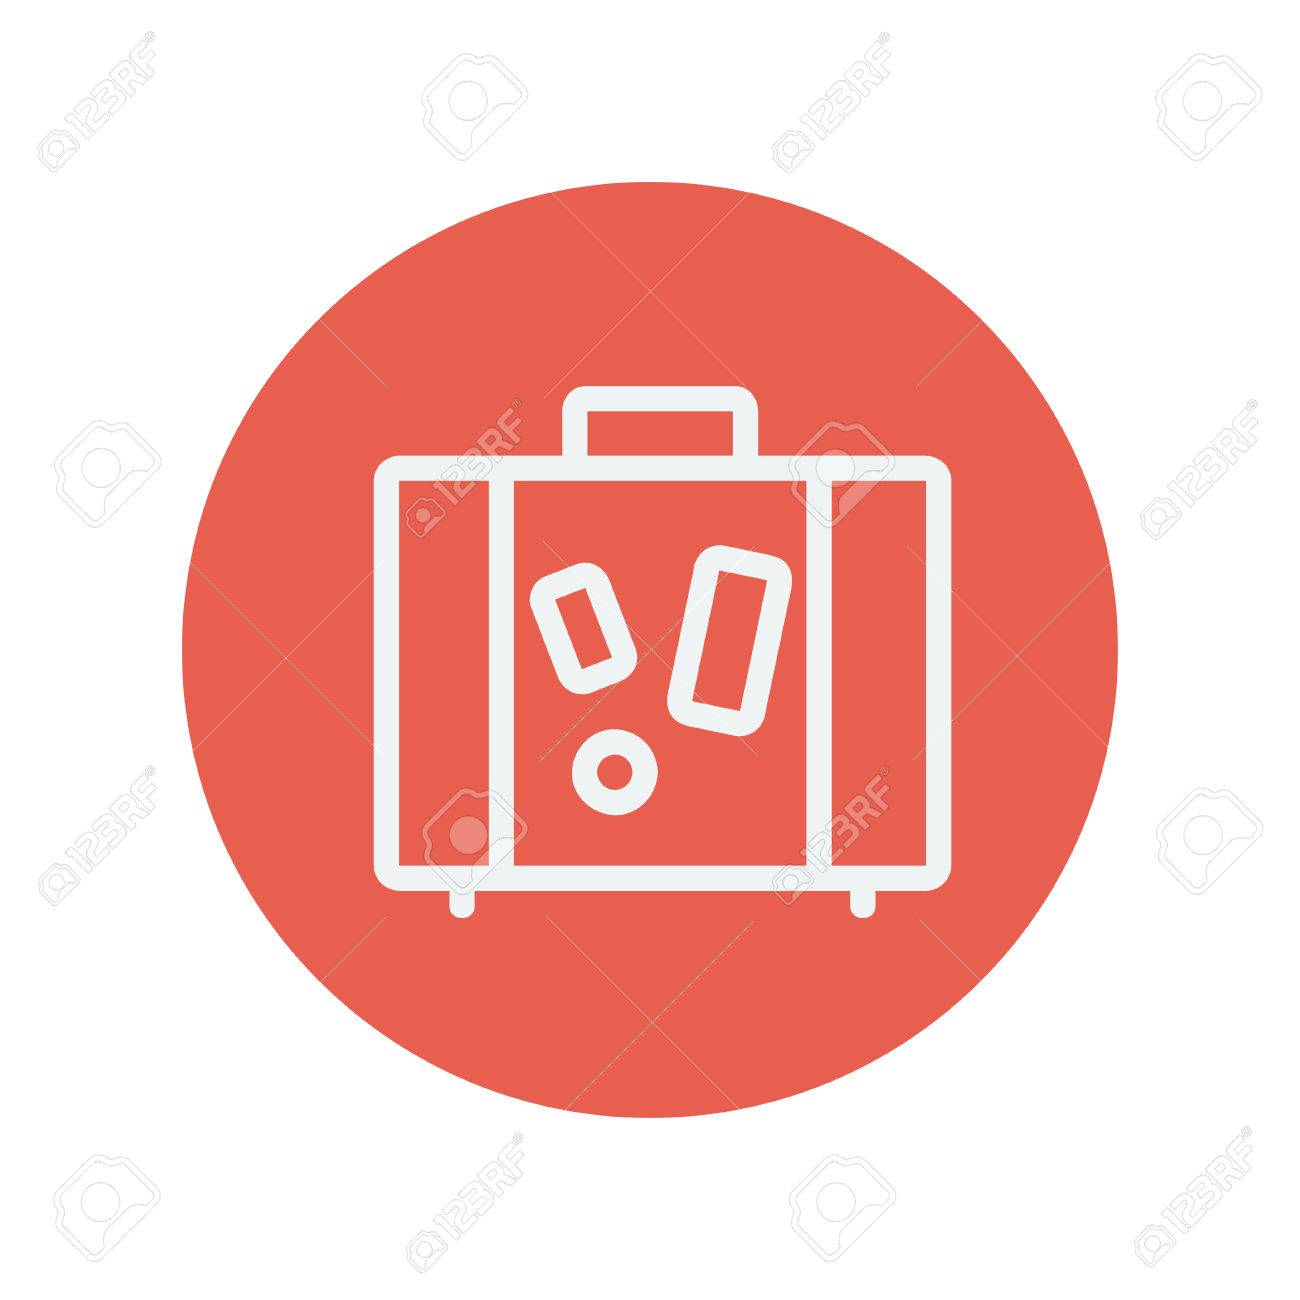 fabulous maleta icono de lnea delgada para la web y el diseo minimalista plana mvil vector with diseo minimalista web - Diseo Minimalista